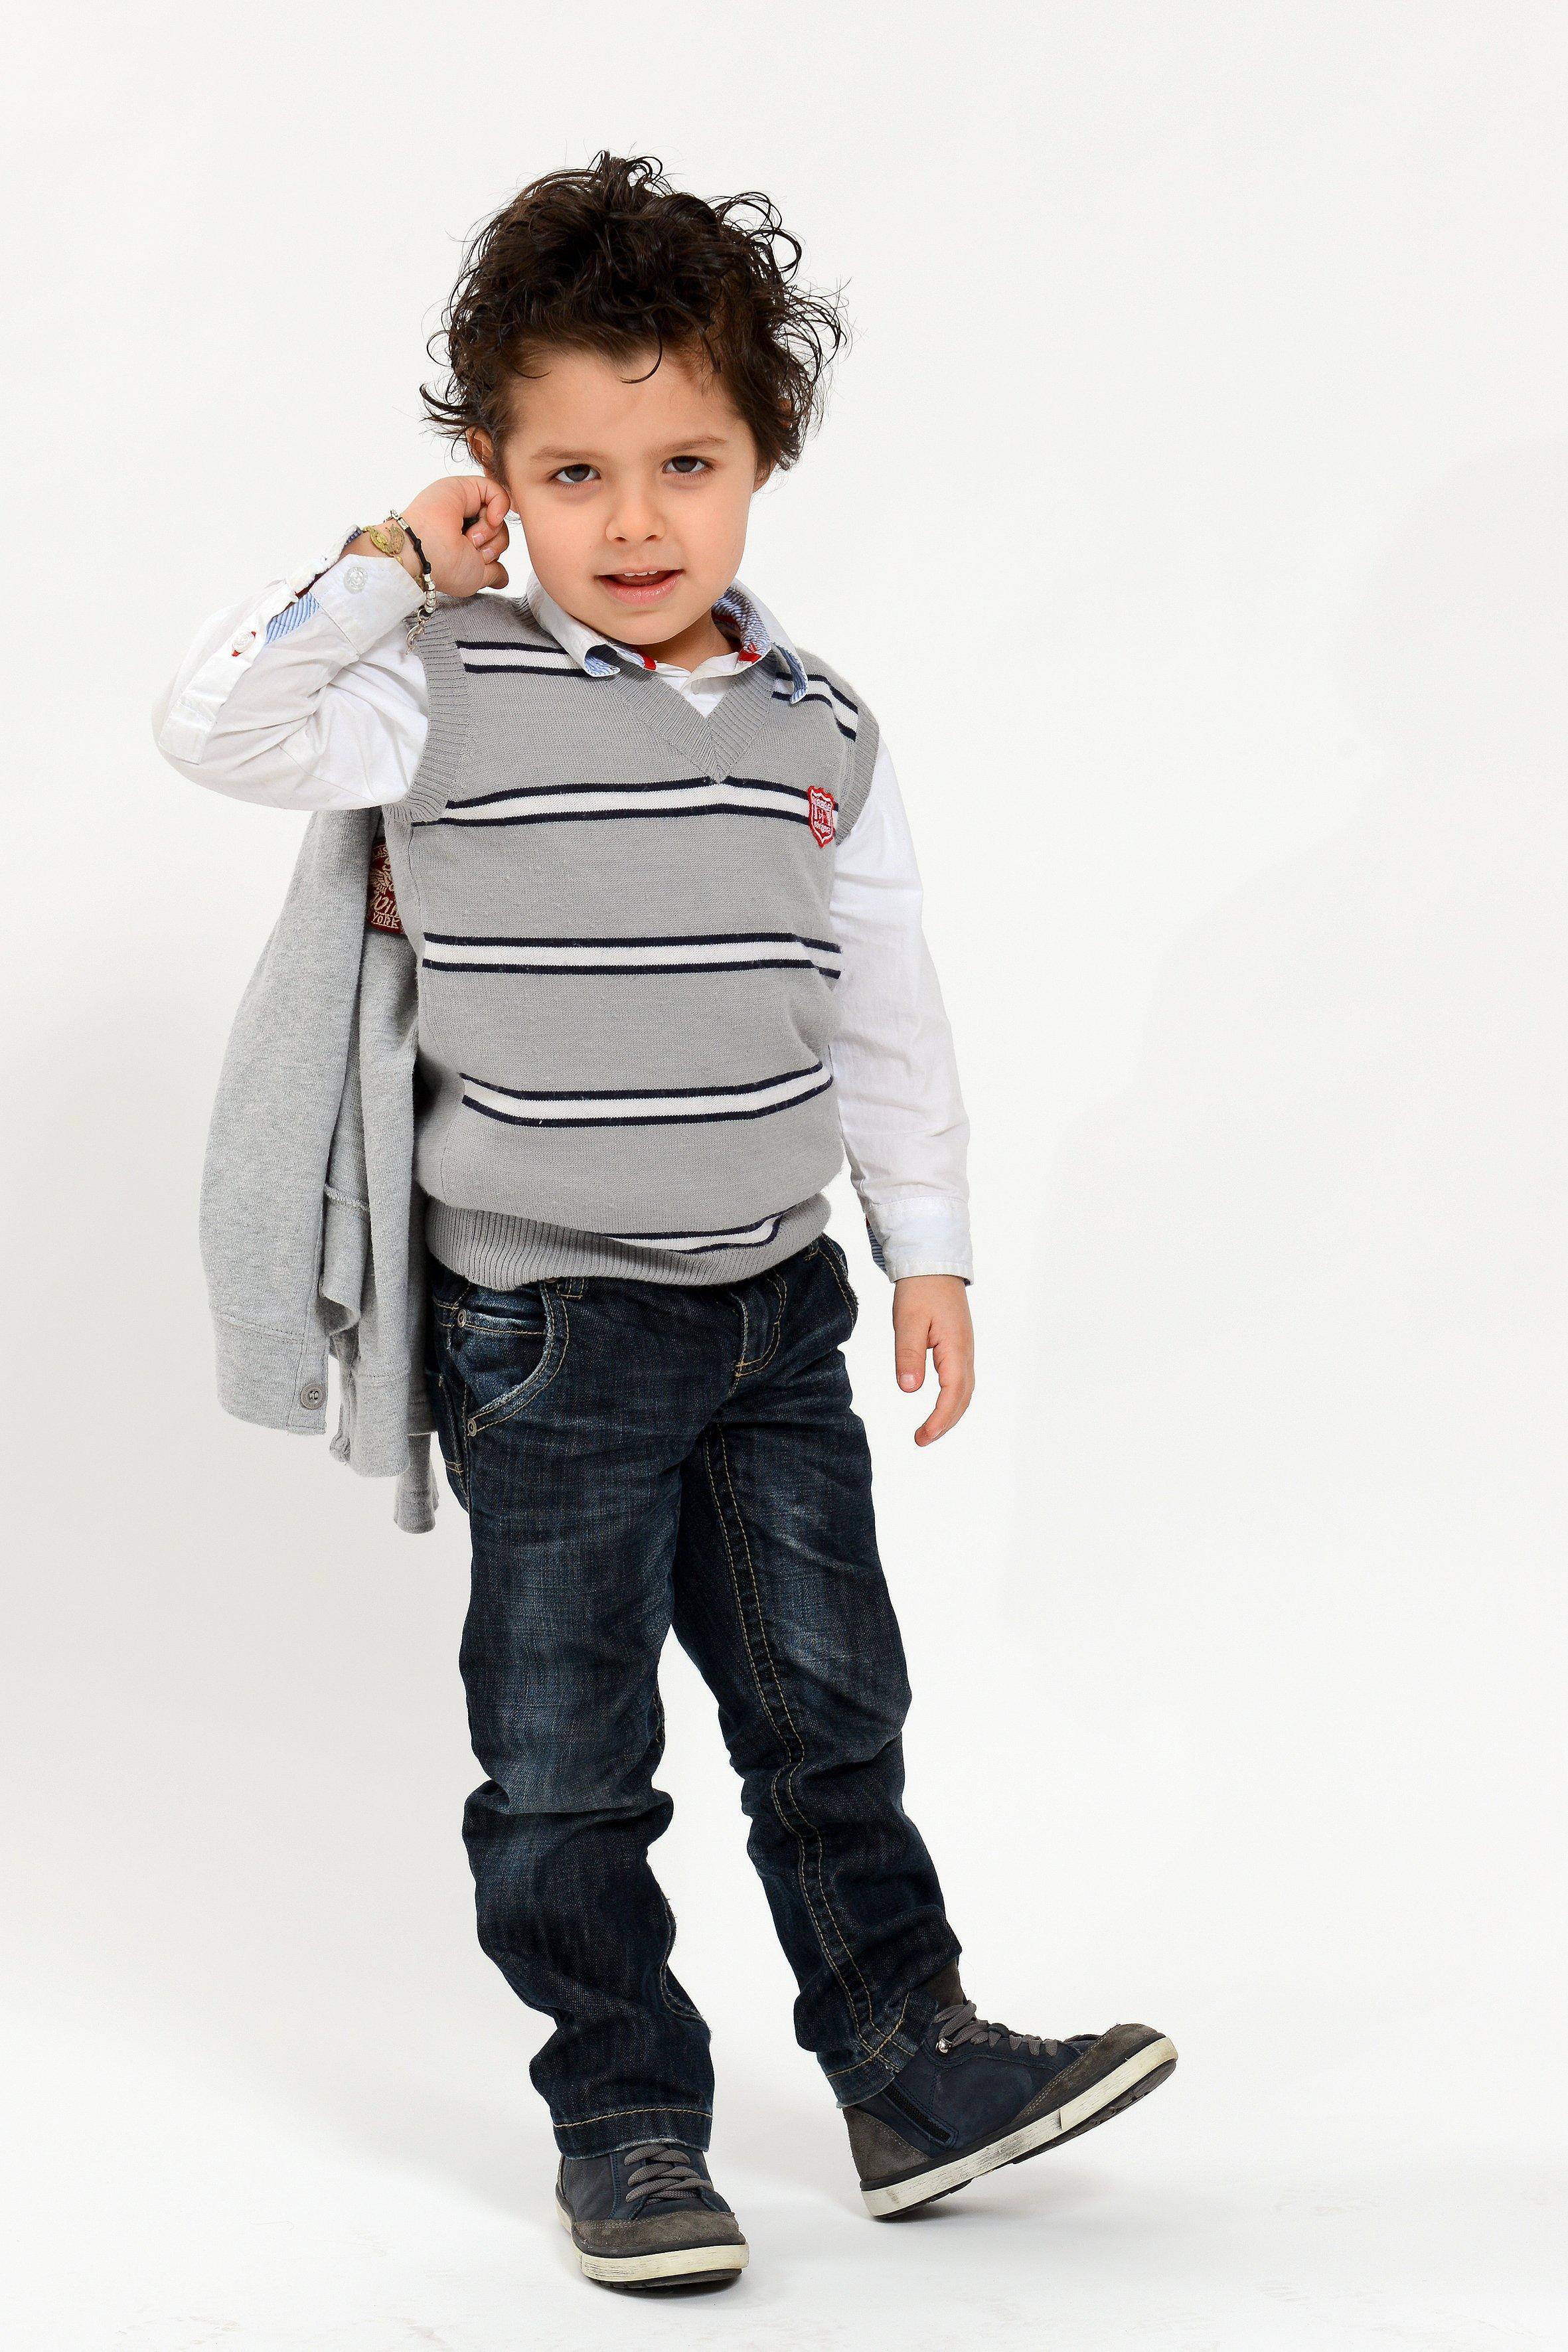 un bambino con un paio di jeans